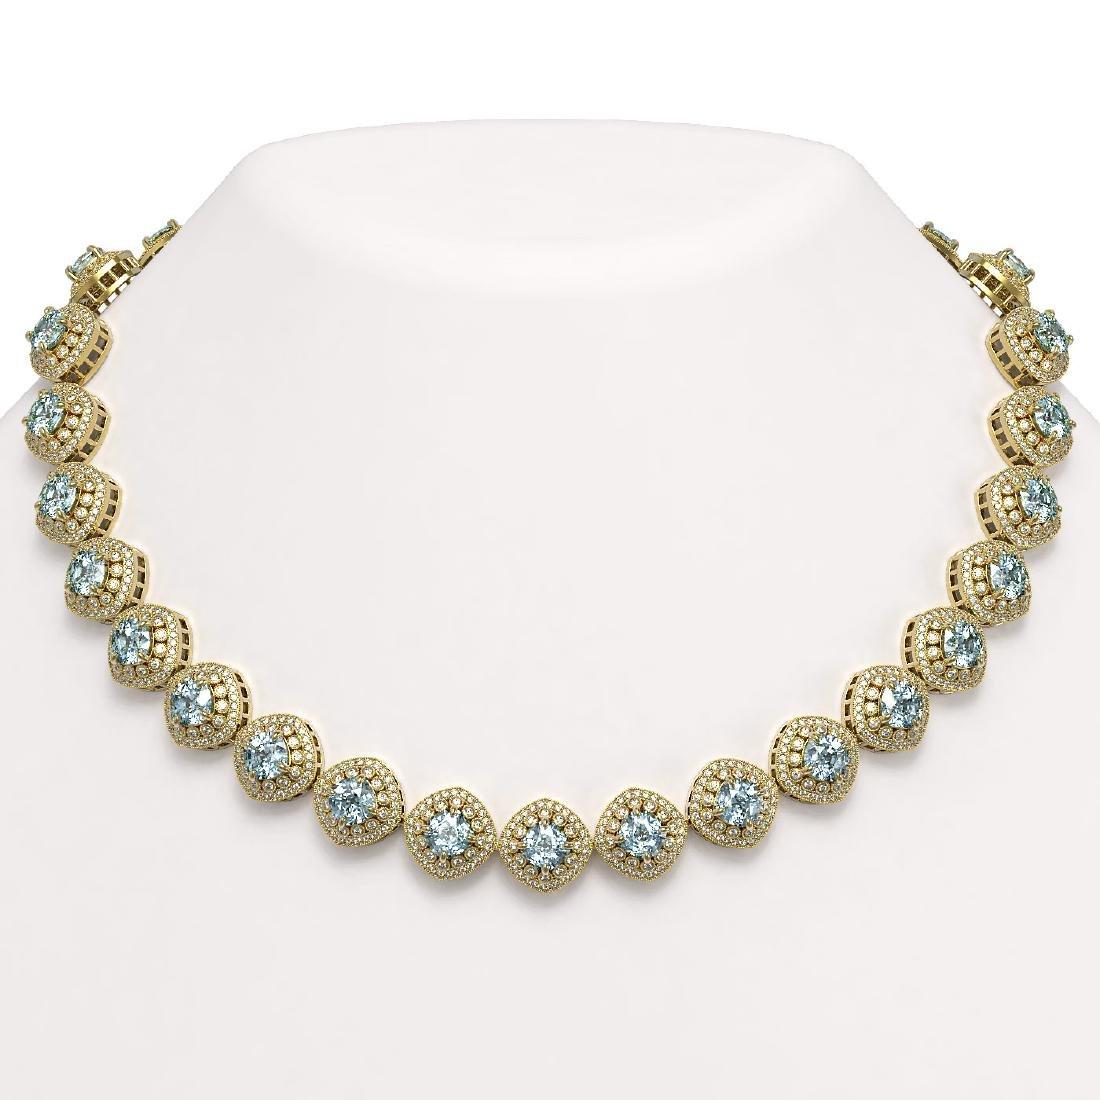 72.27 ctw Aquamarine & Diamond Necklace 14K Yellow Gold